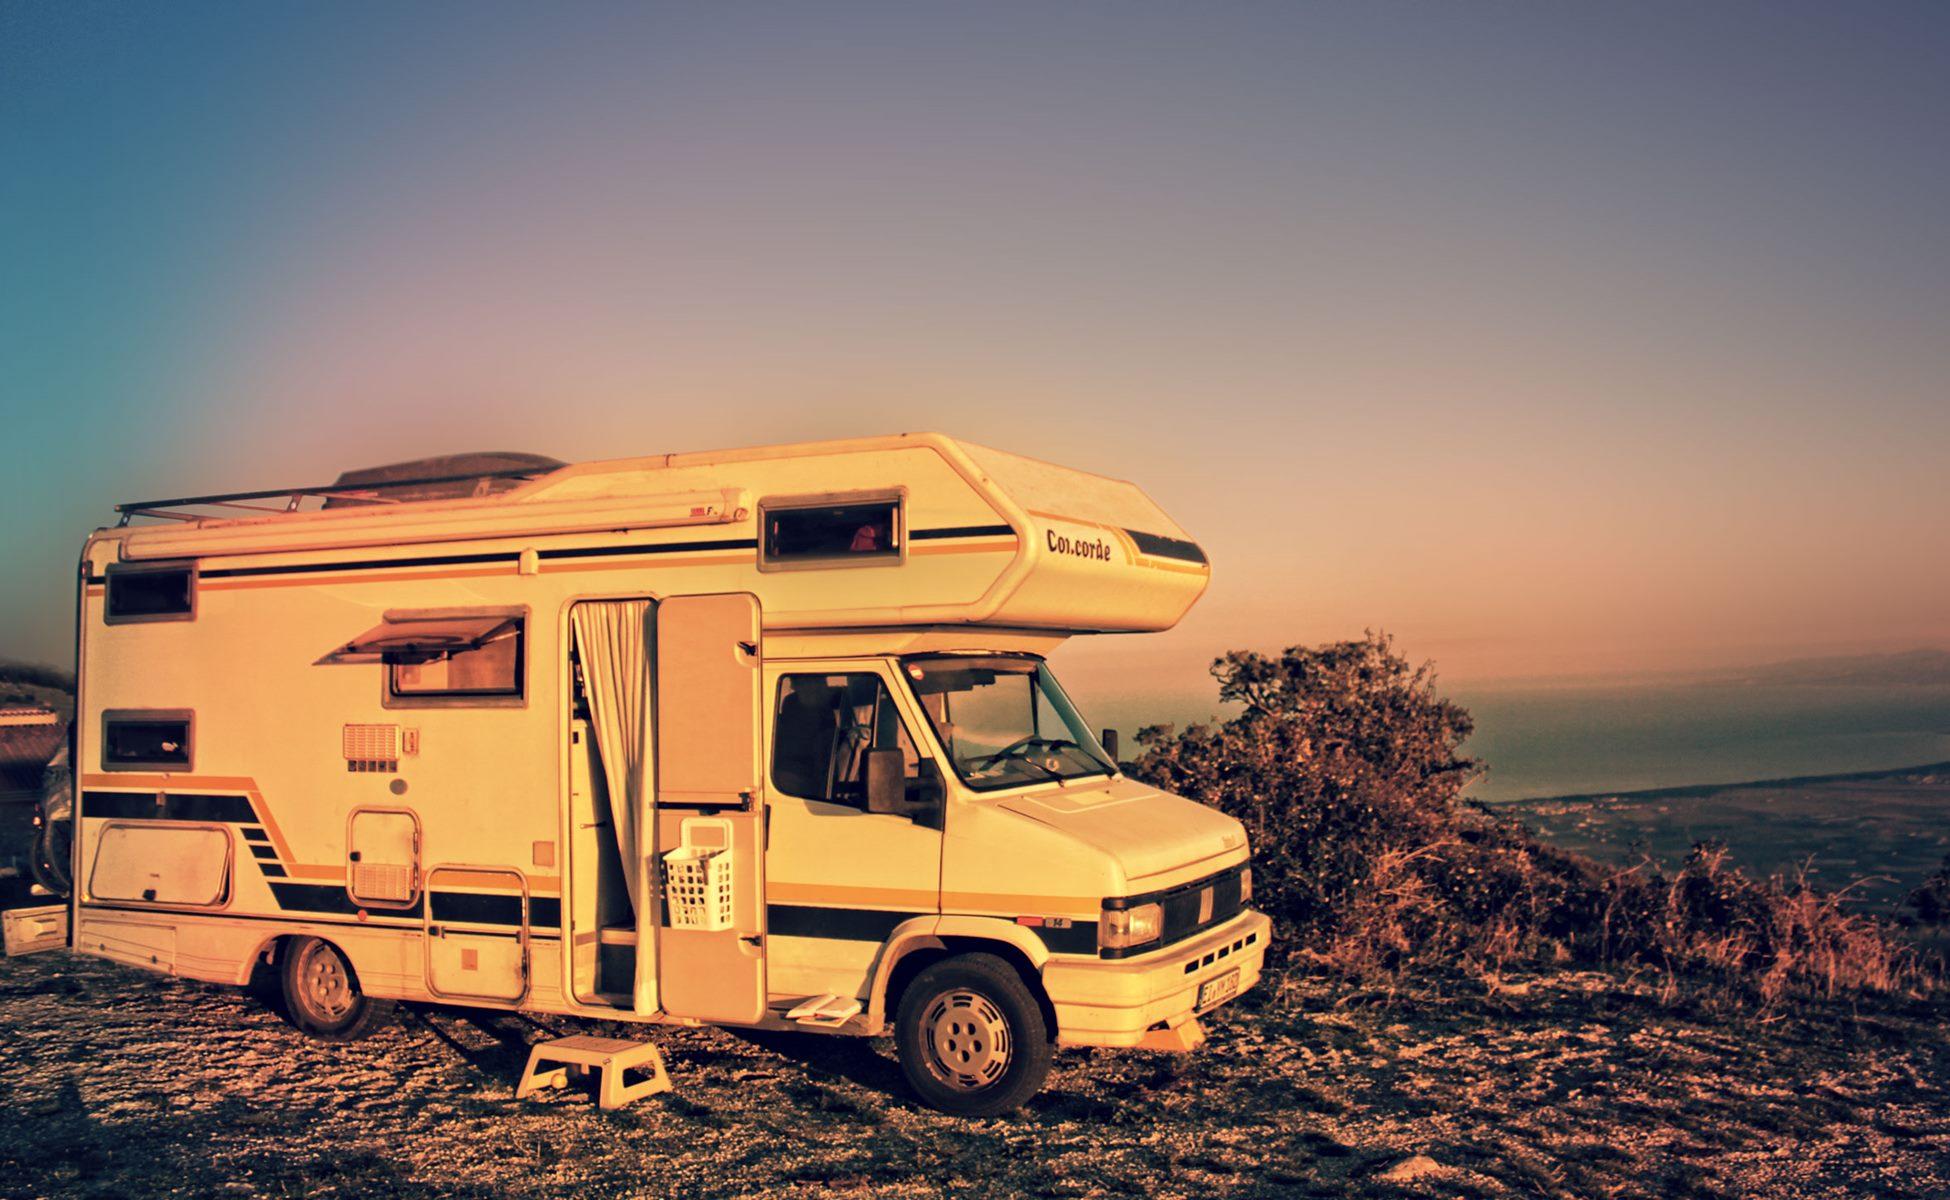 Wohnmobil Abendsonne Italien